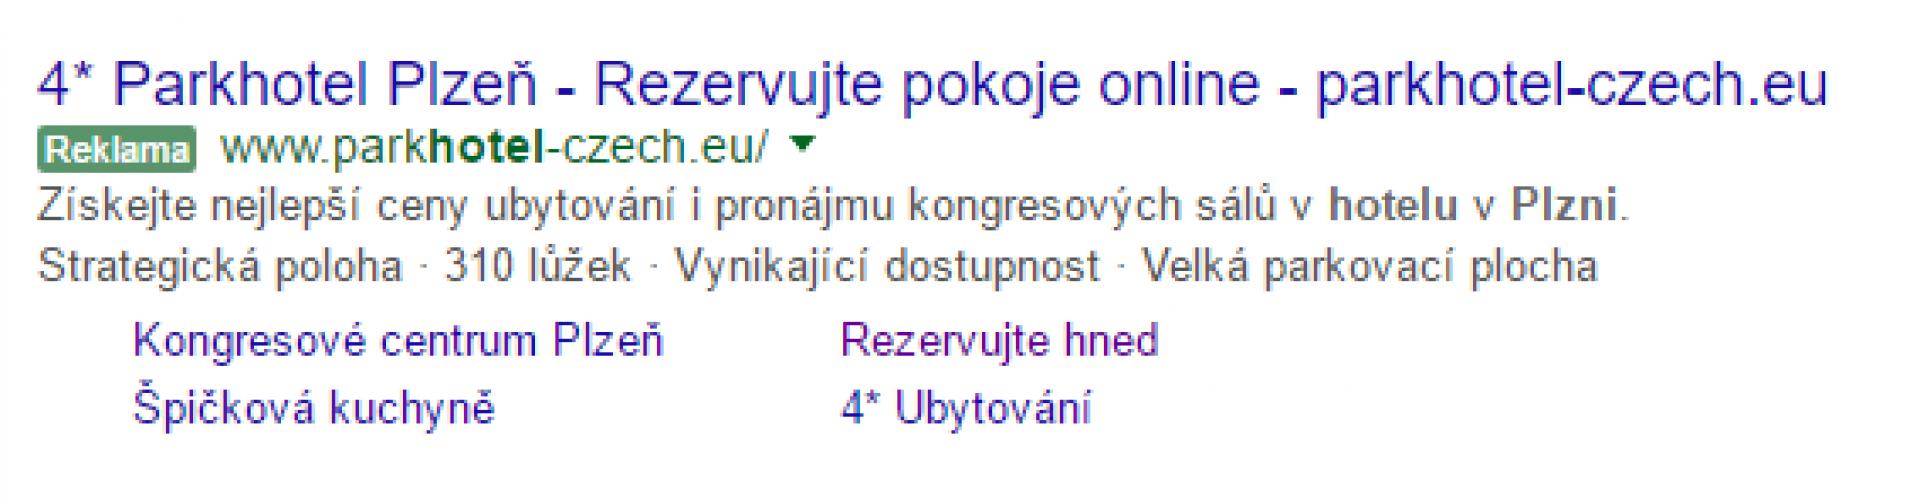 Reklama na Parkhotel Plzeň